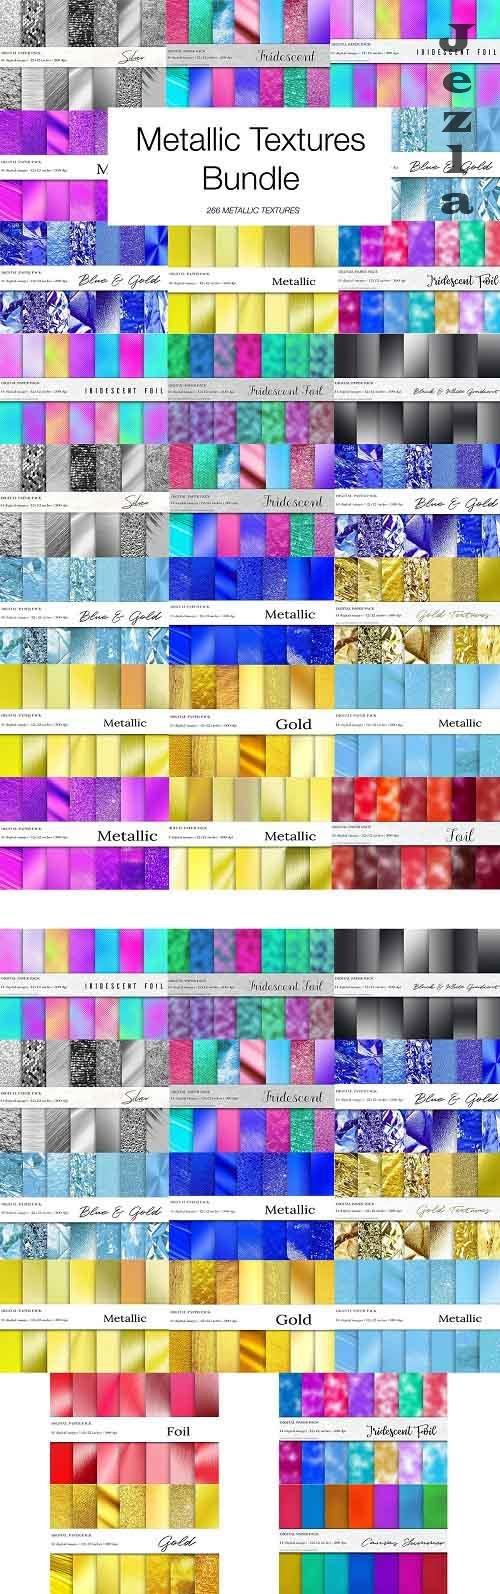 266 Metallic Textures Bundle - 4964246